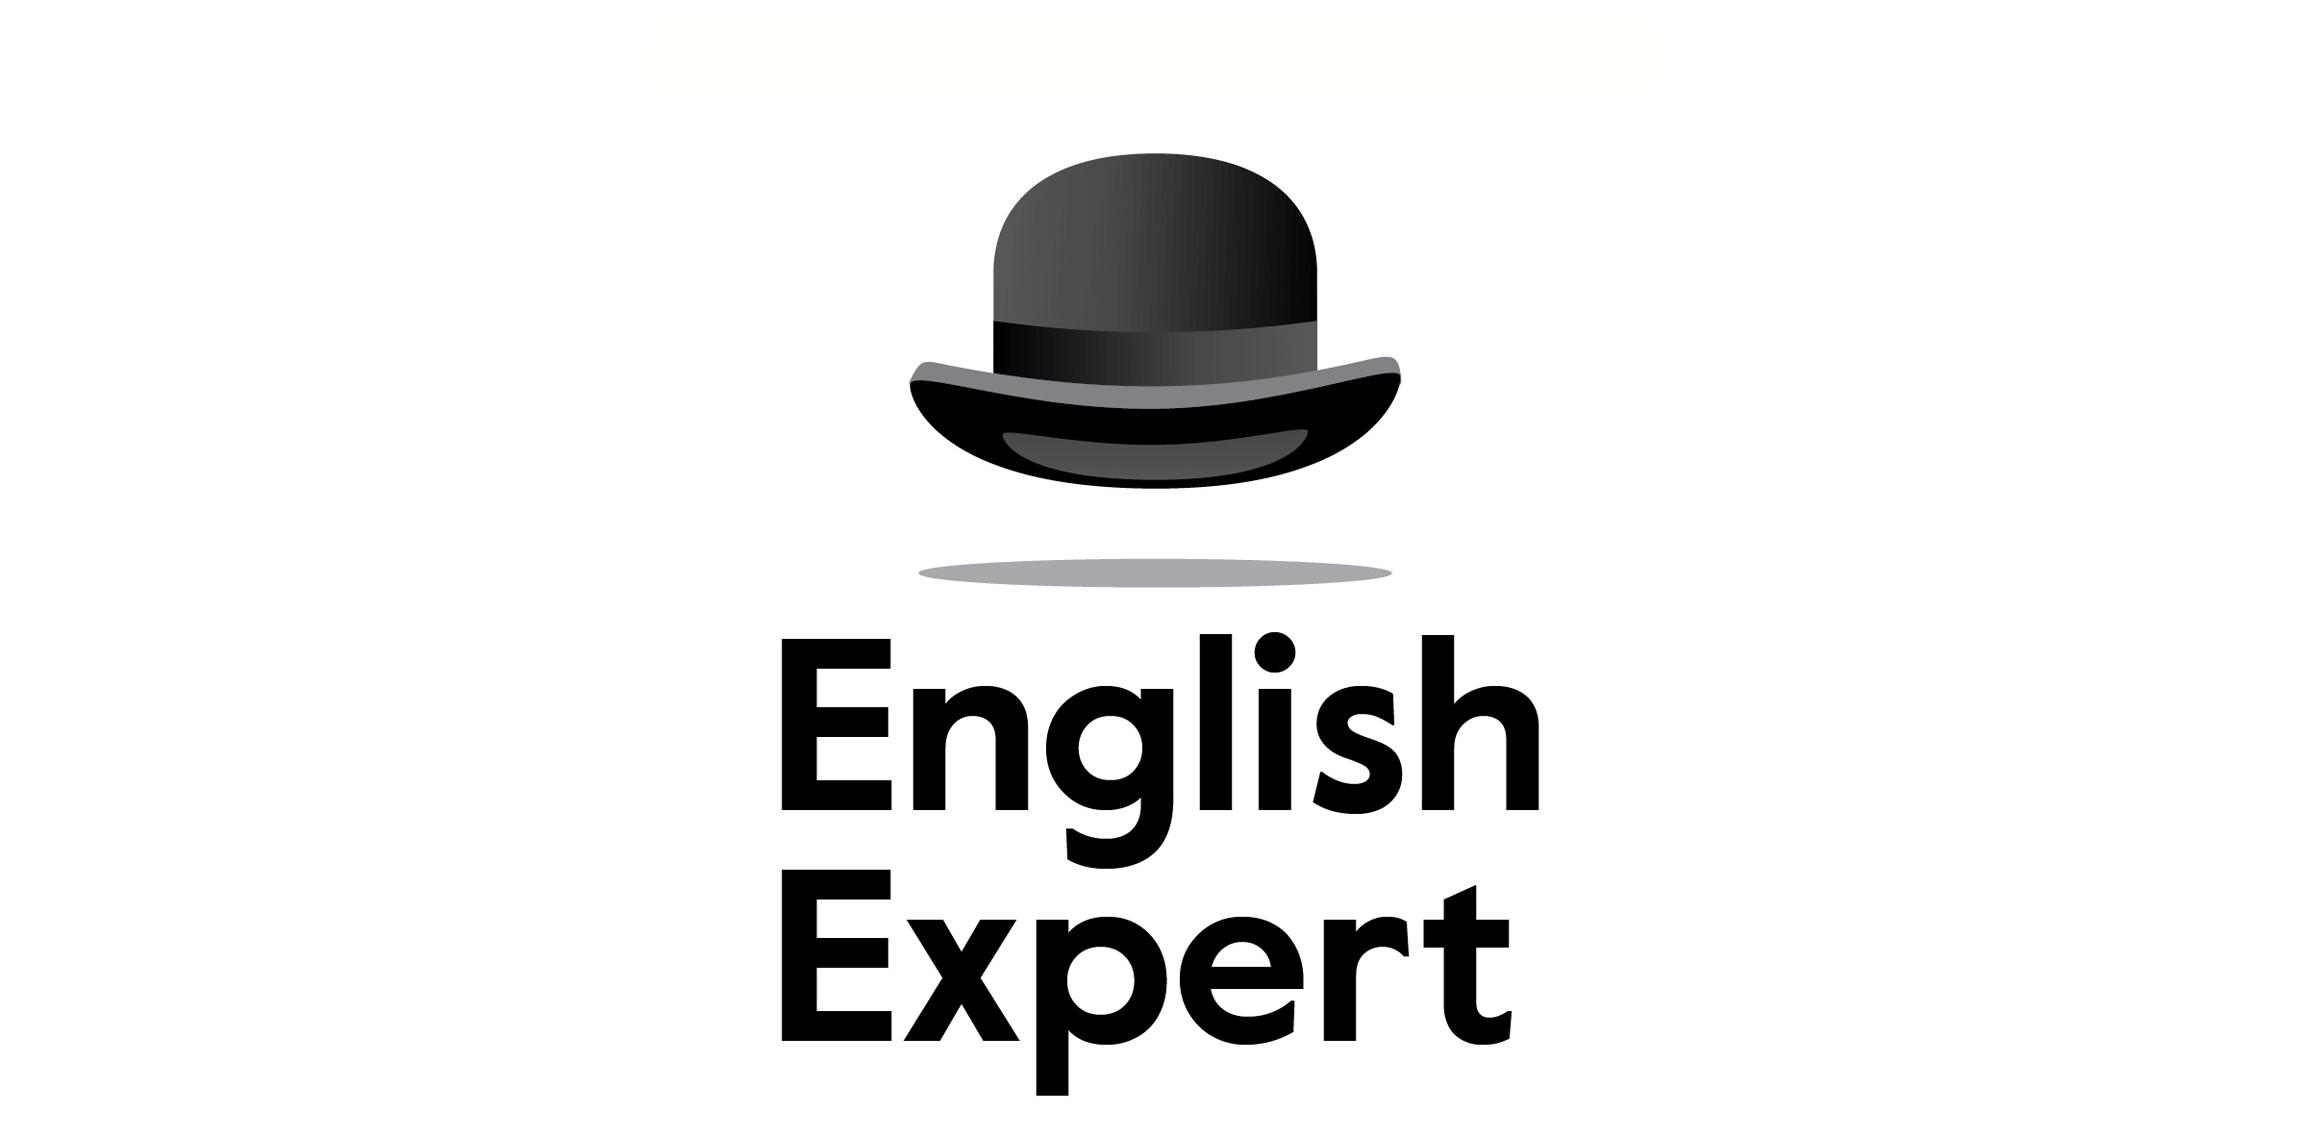 English Expert